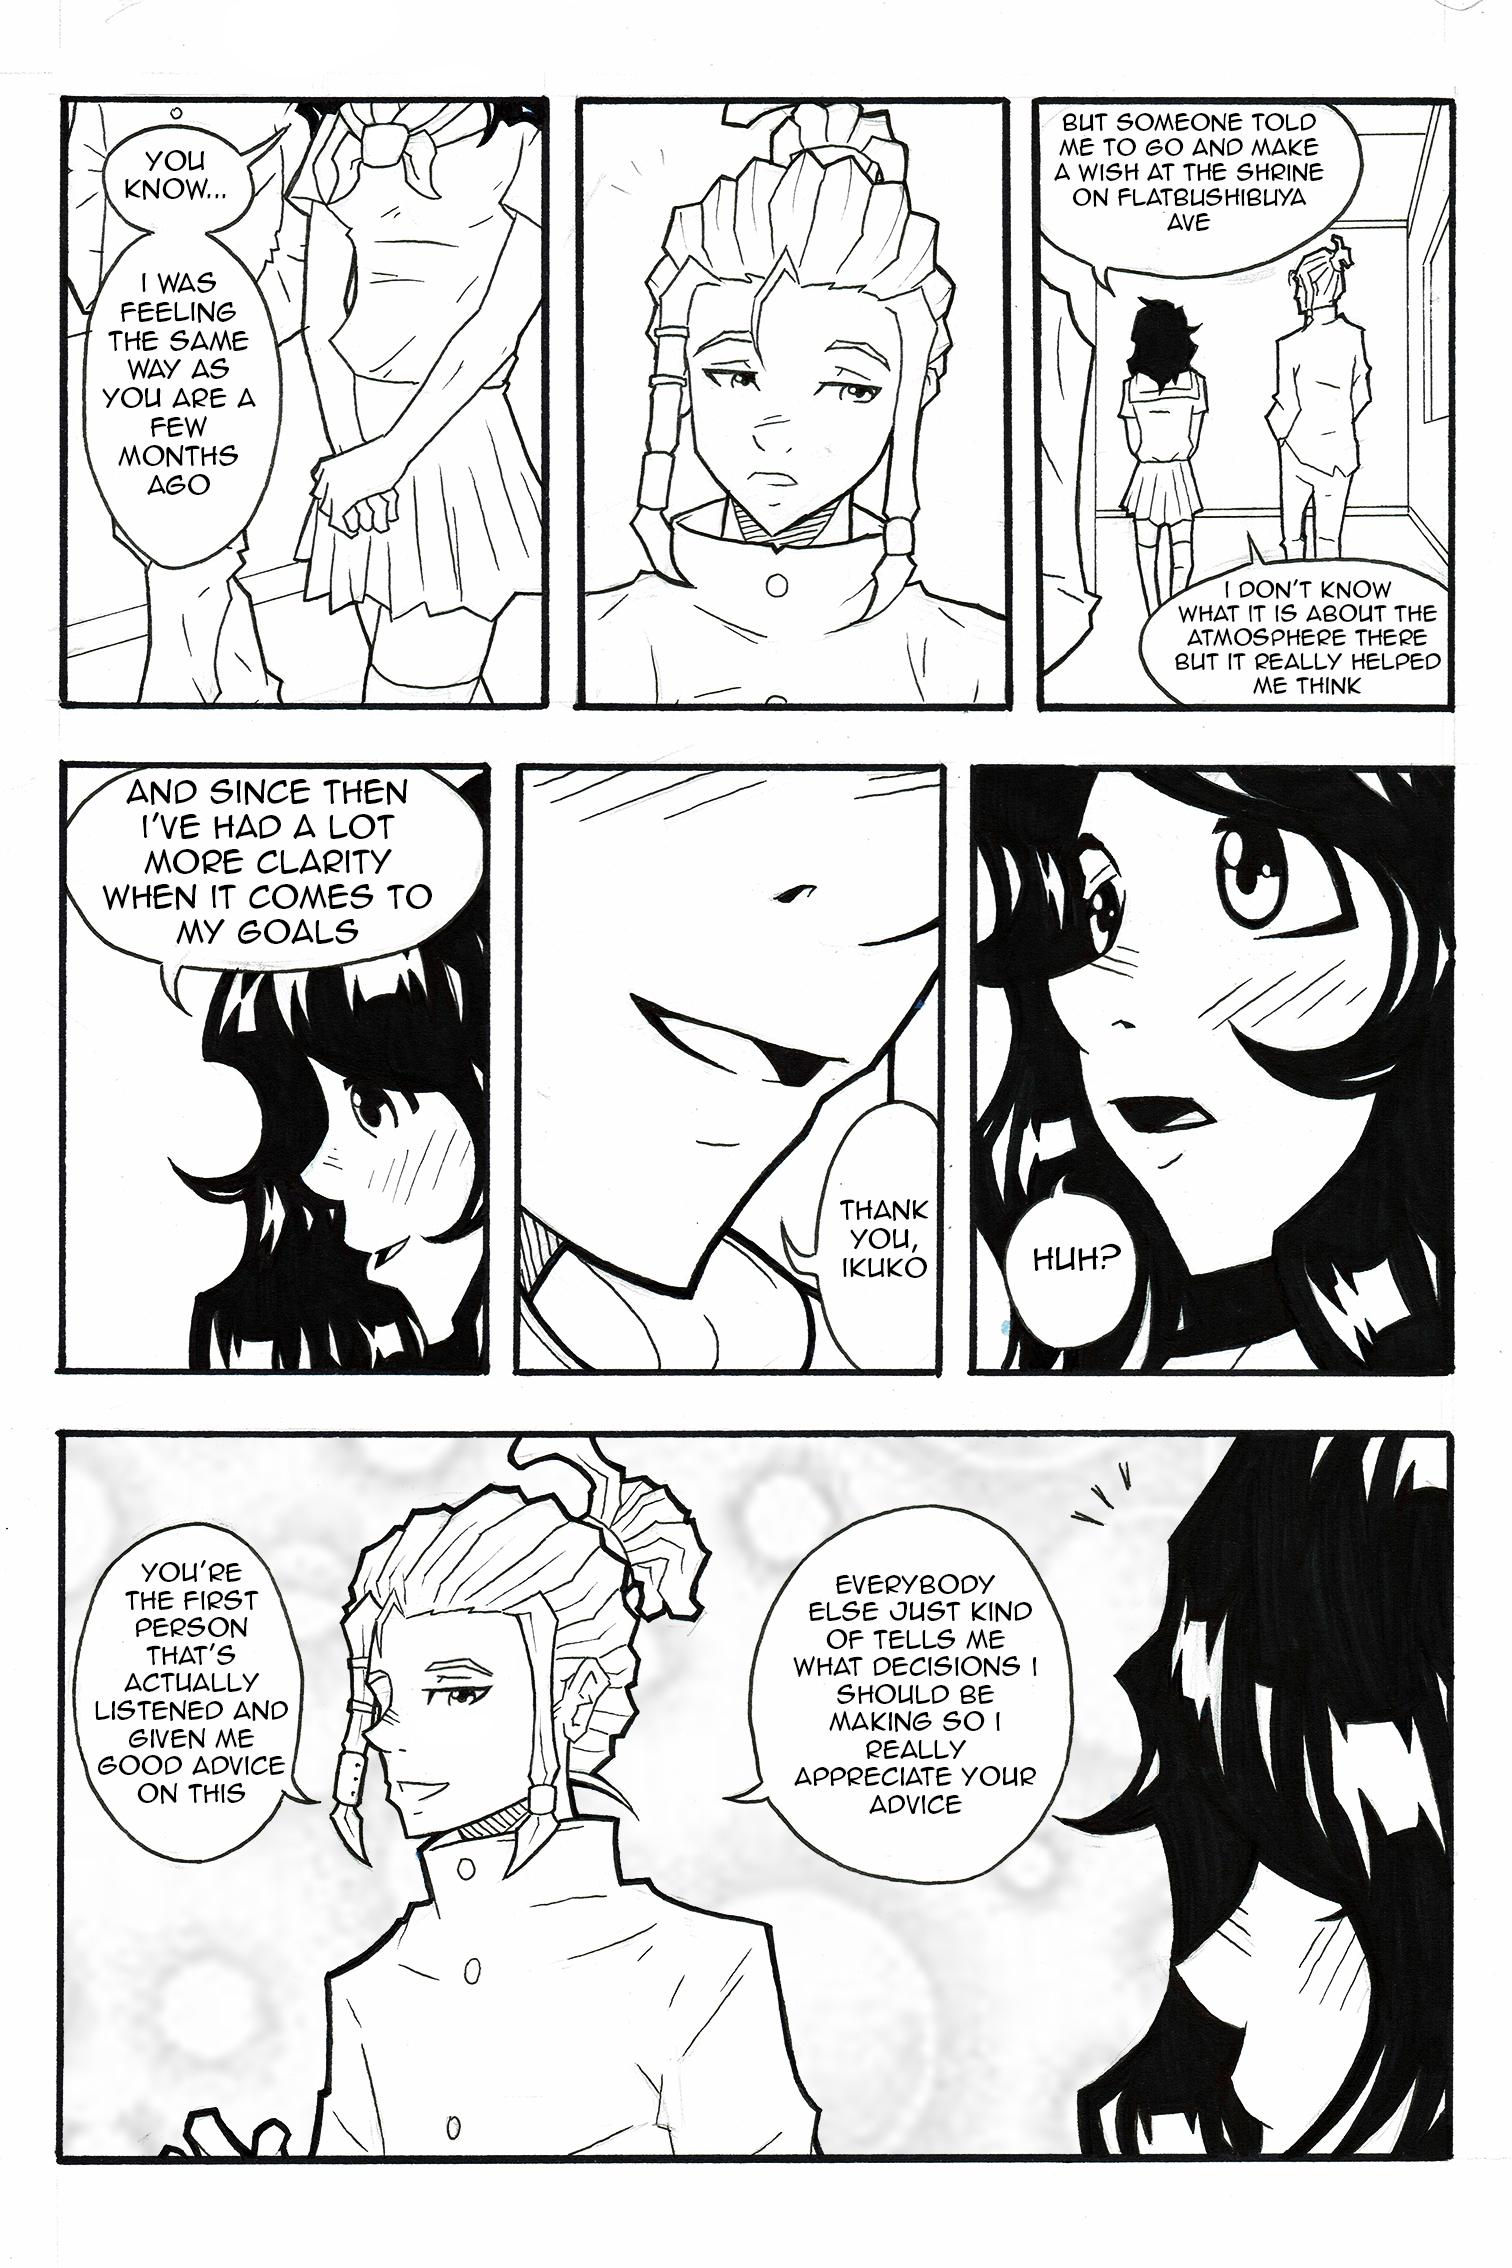 C1 PAGE 29.jpg